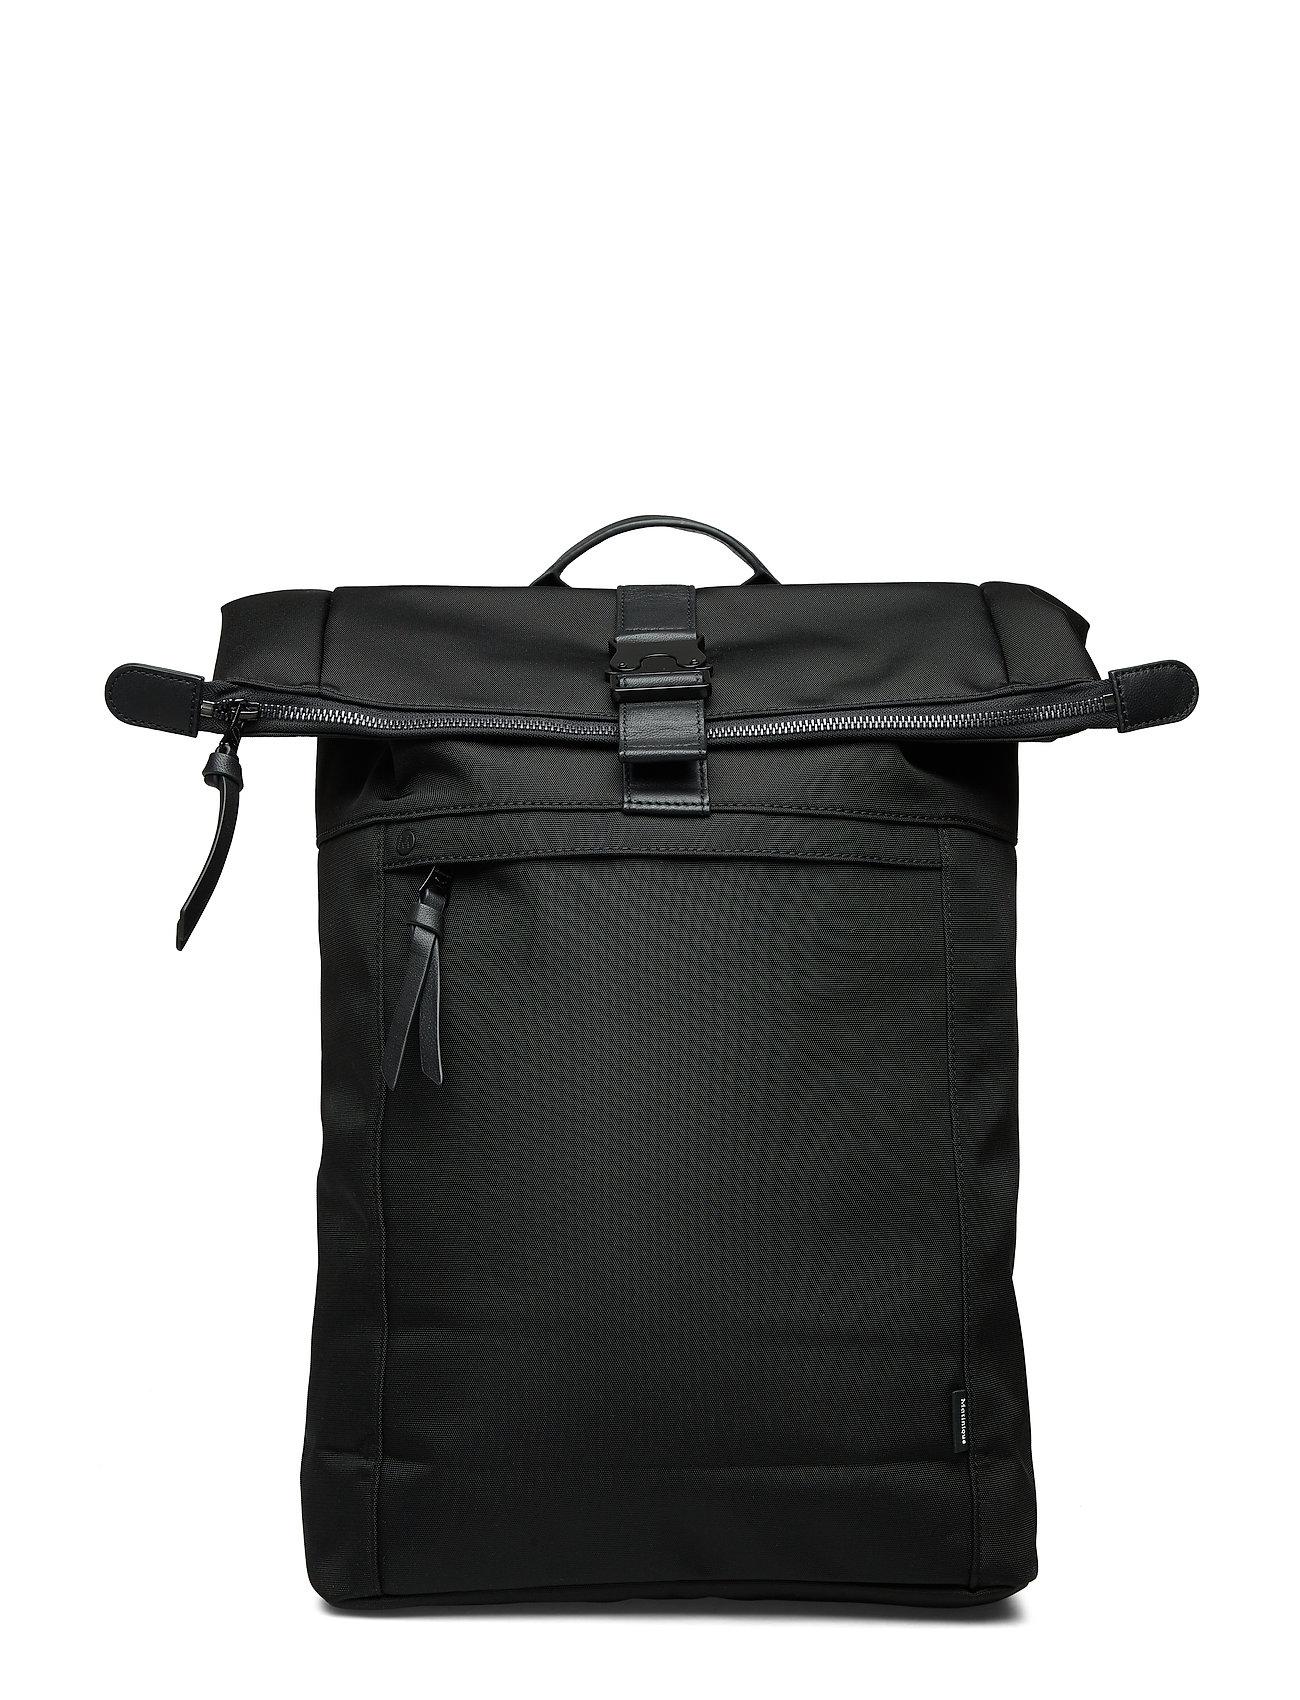 Matinique FoldanMA Backpack Nylon Bag - BLACK